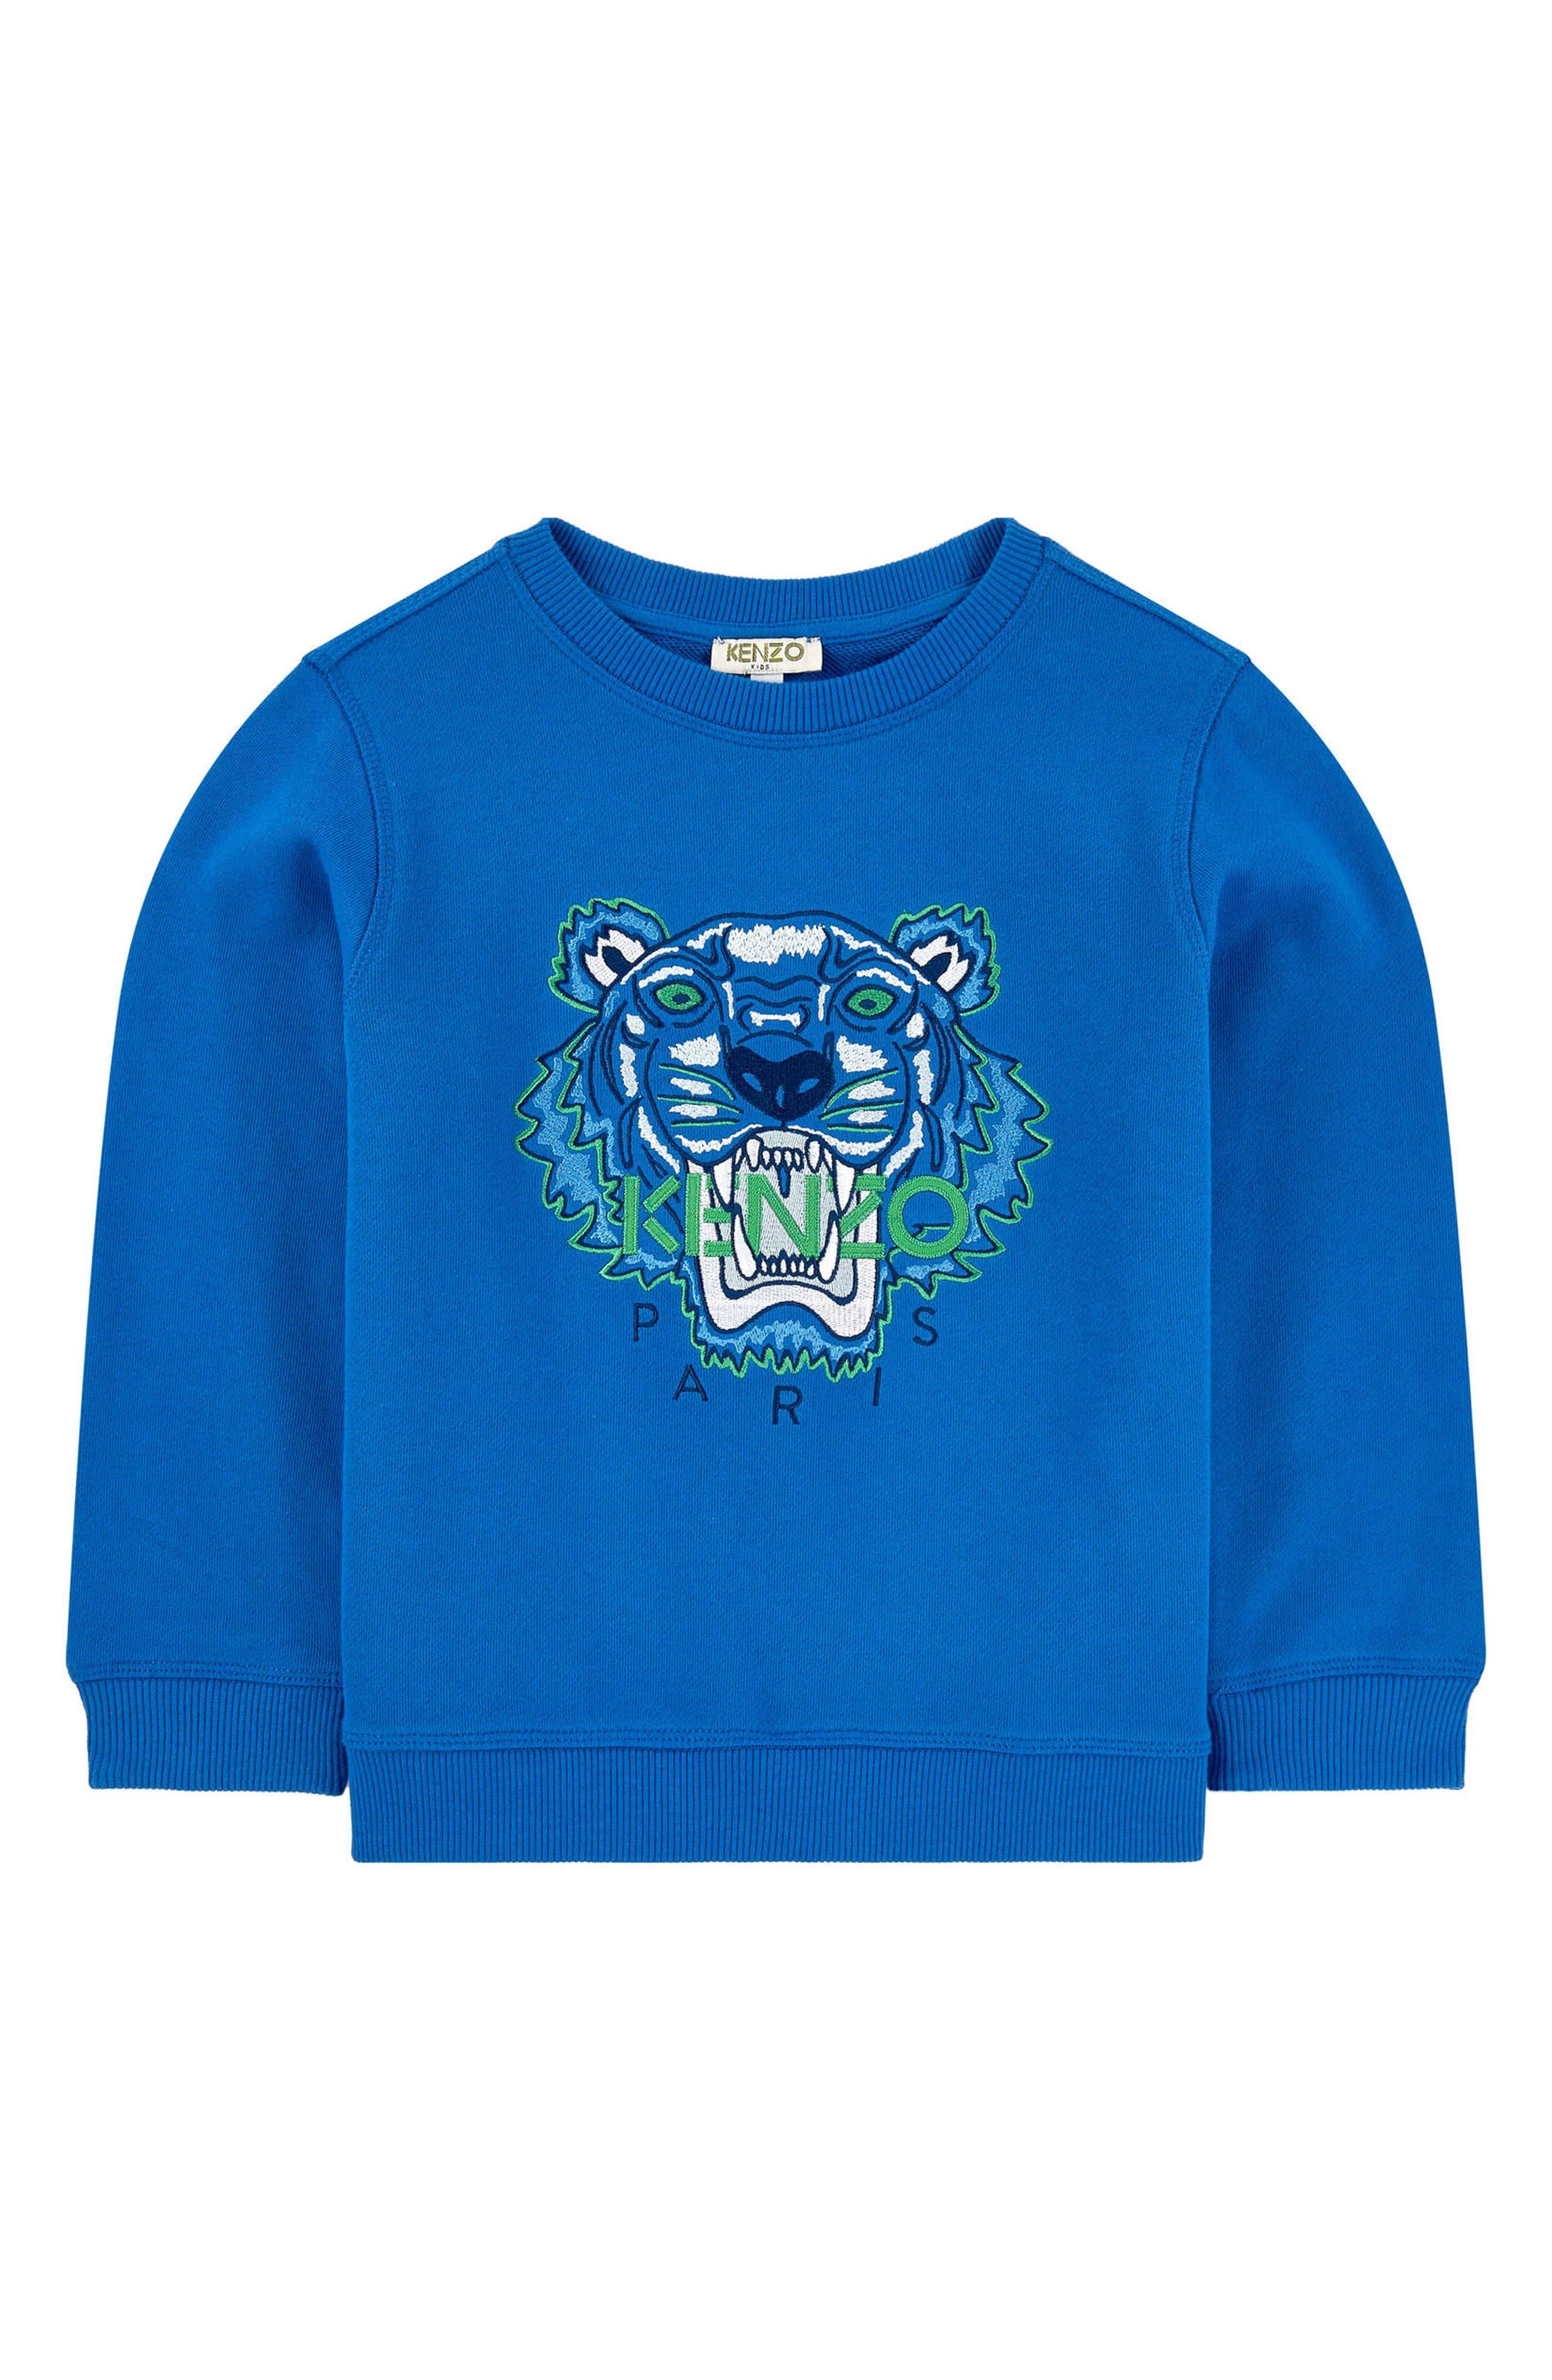 KENZO Embroidered Tiger Logo Sweatshirt, Main, color, ROYAL BLUE